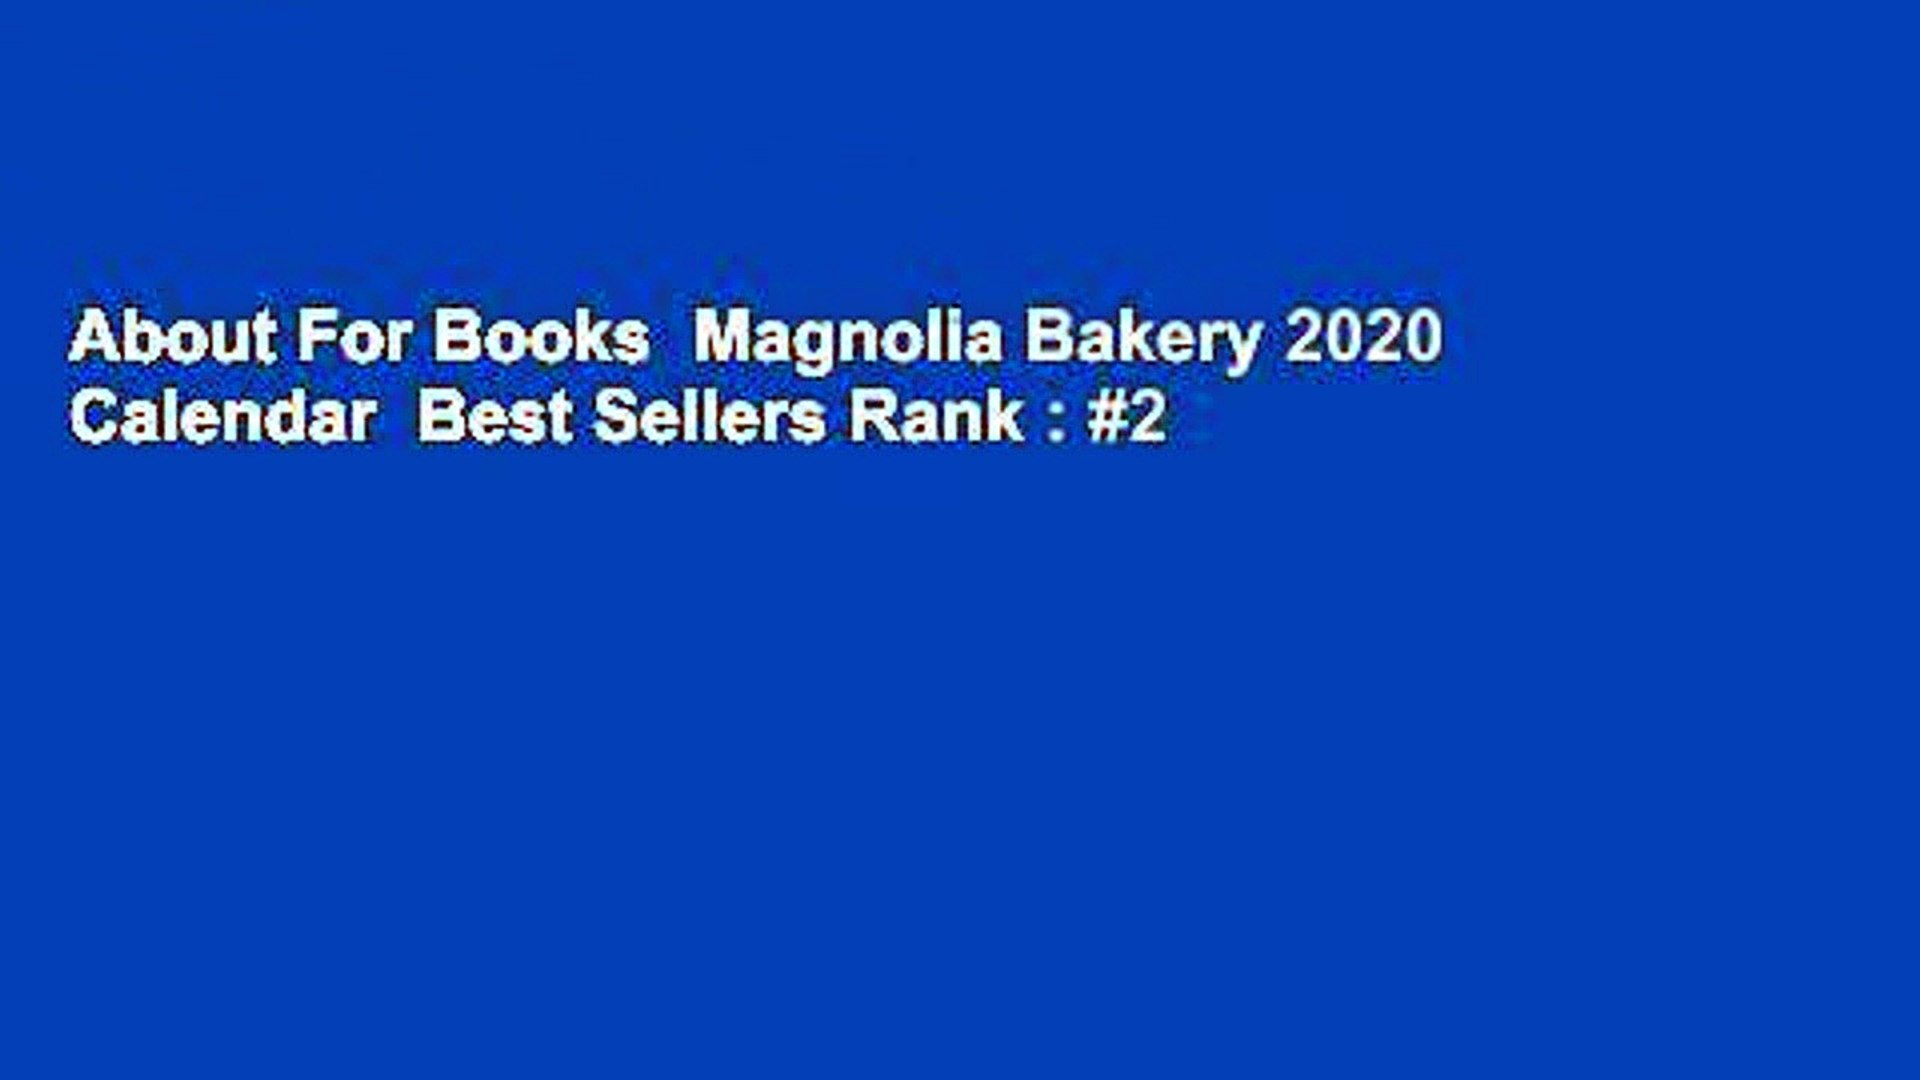 Best Seller Books 2020.About For Books Magnolia Bakery 2020 Calendar Best Sellers Rank 2